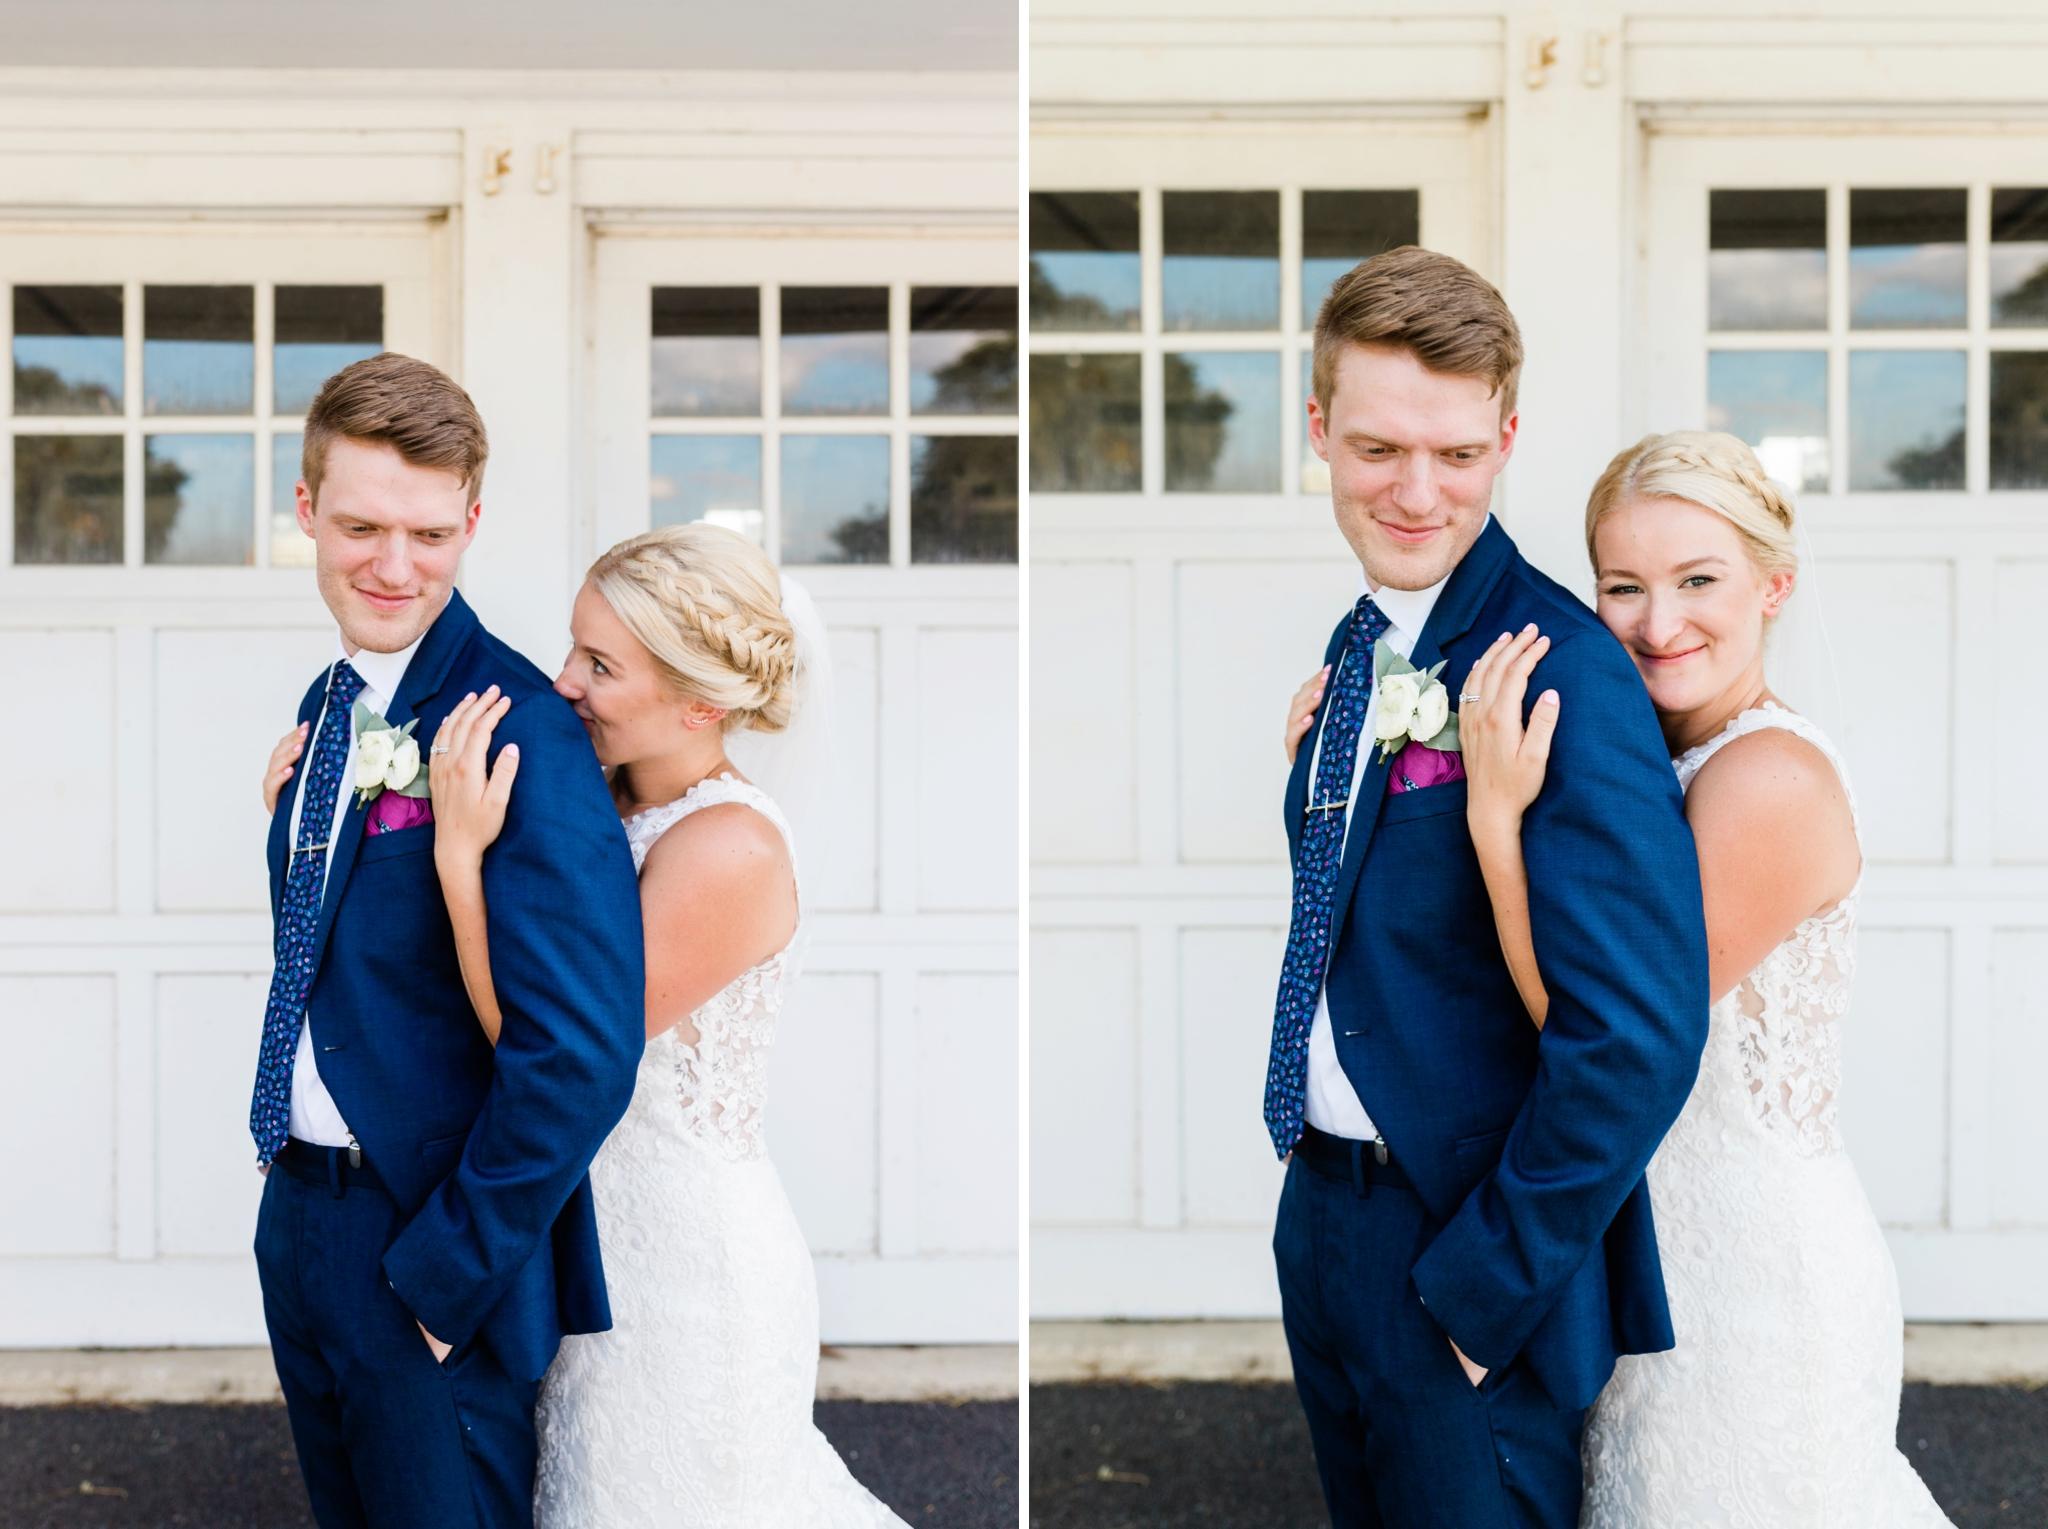 Emily Grace Photography, Lancaster PA Wedding Photographer, Wedding Photography for Unique Couples, The Barn at Silverstone, Lancaster PA Wedding Venue, The Barn at Silverstone Couples Portraits